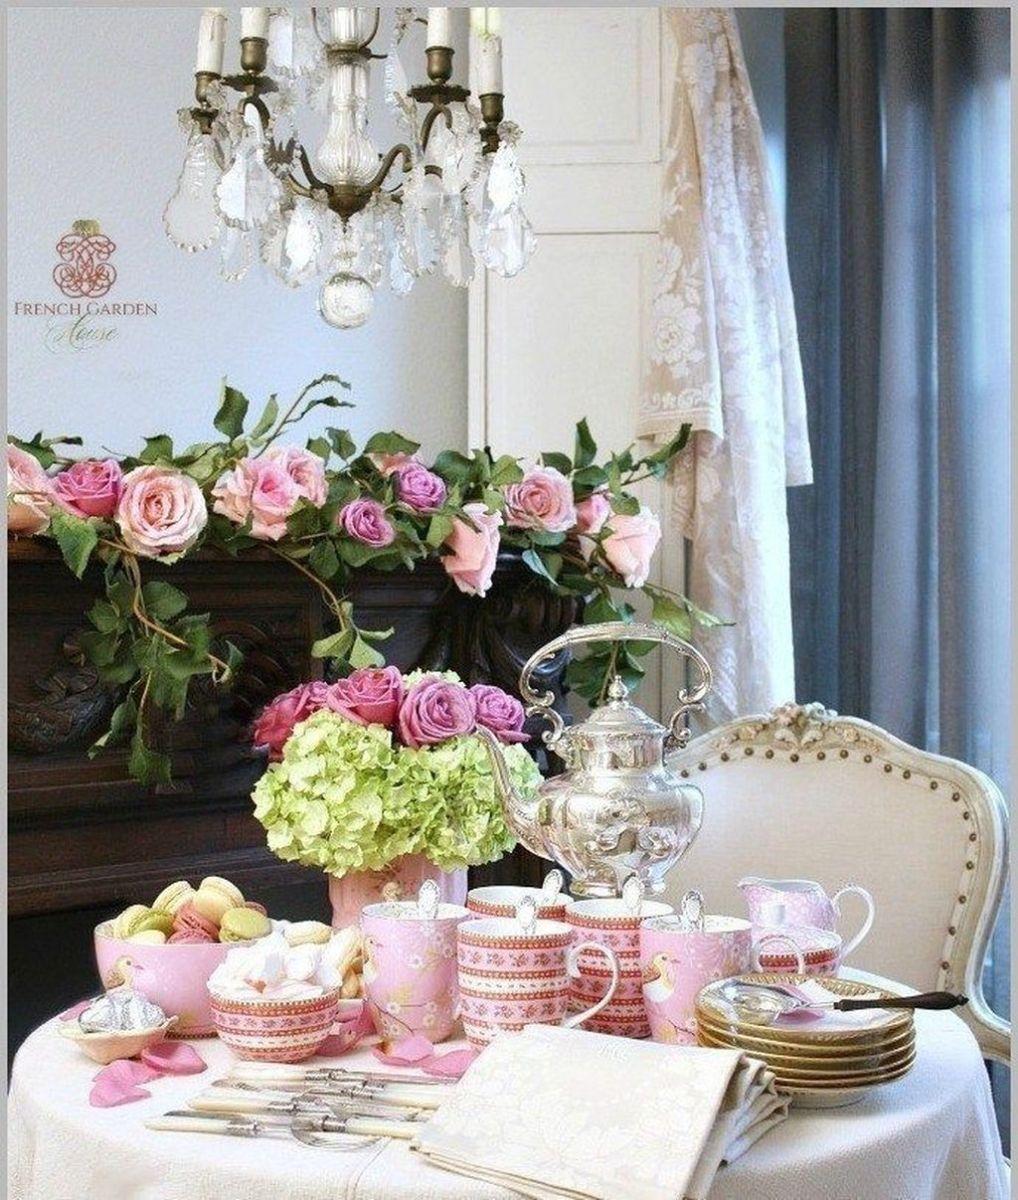 Inspiring Romantic Dining Table Decor Ideas 06